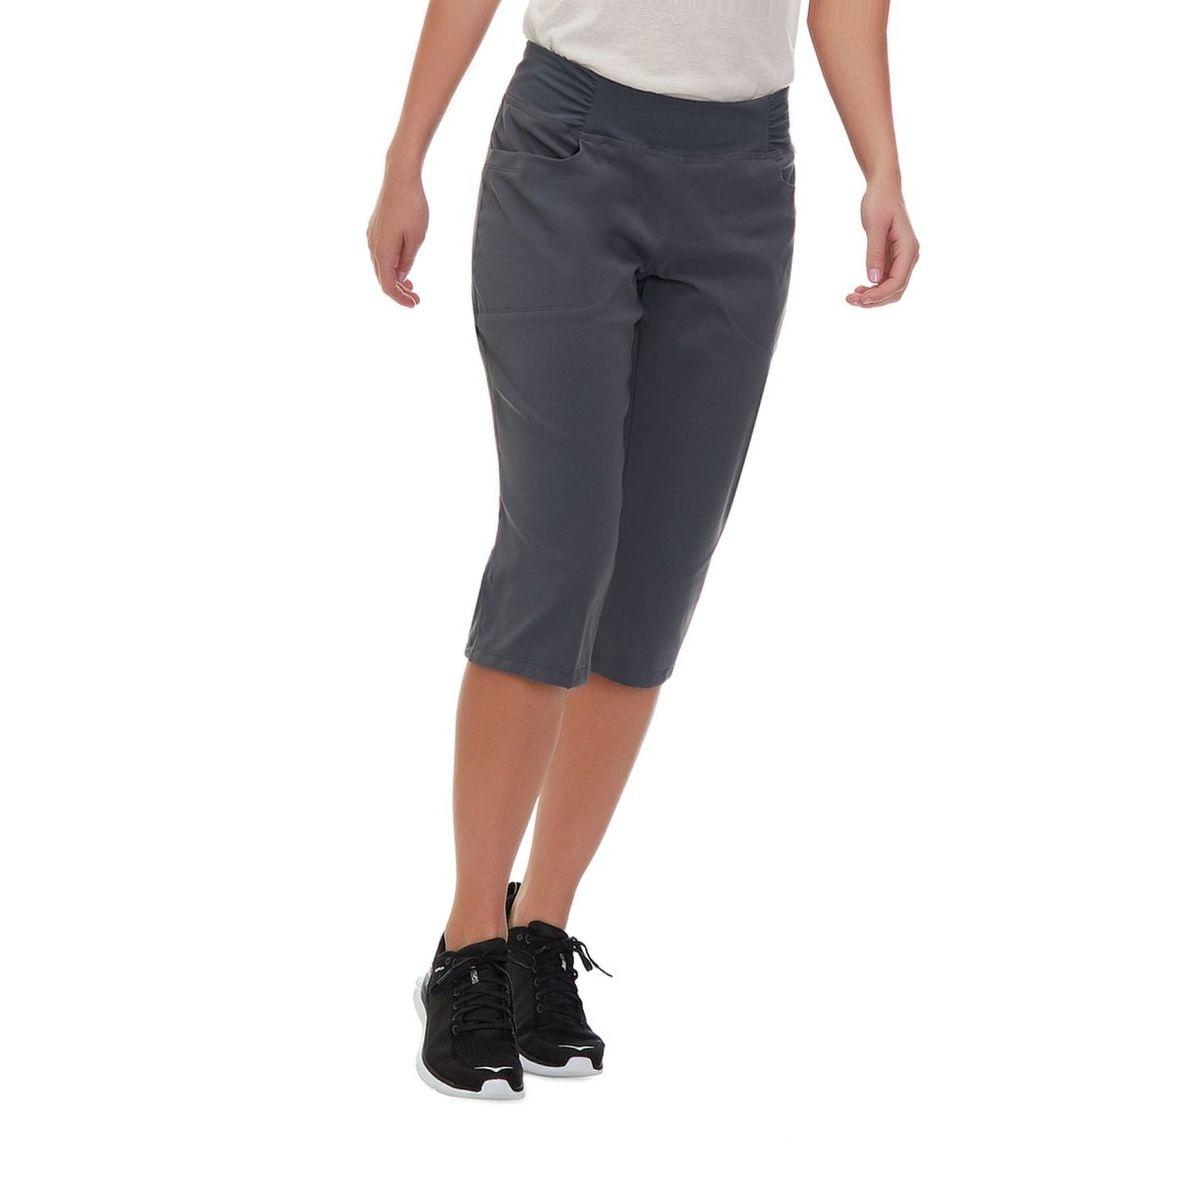 Mountain Hardwear Dynama Capri Pant - Women's